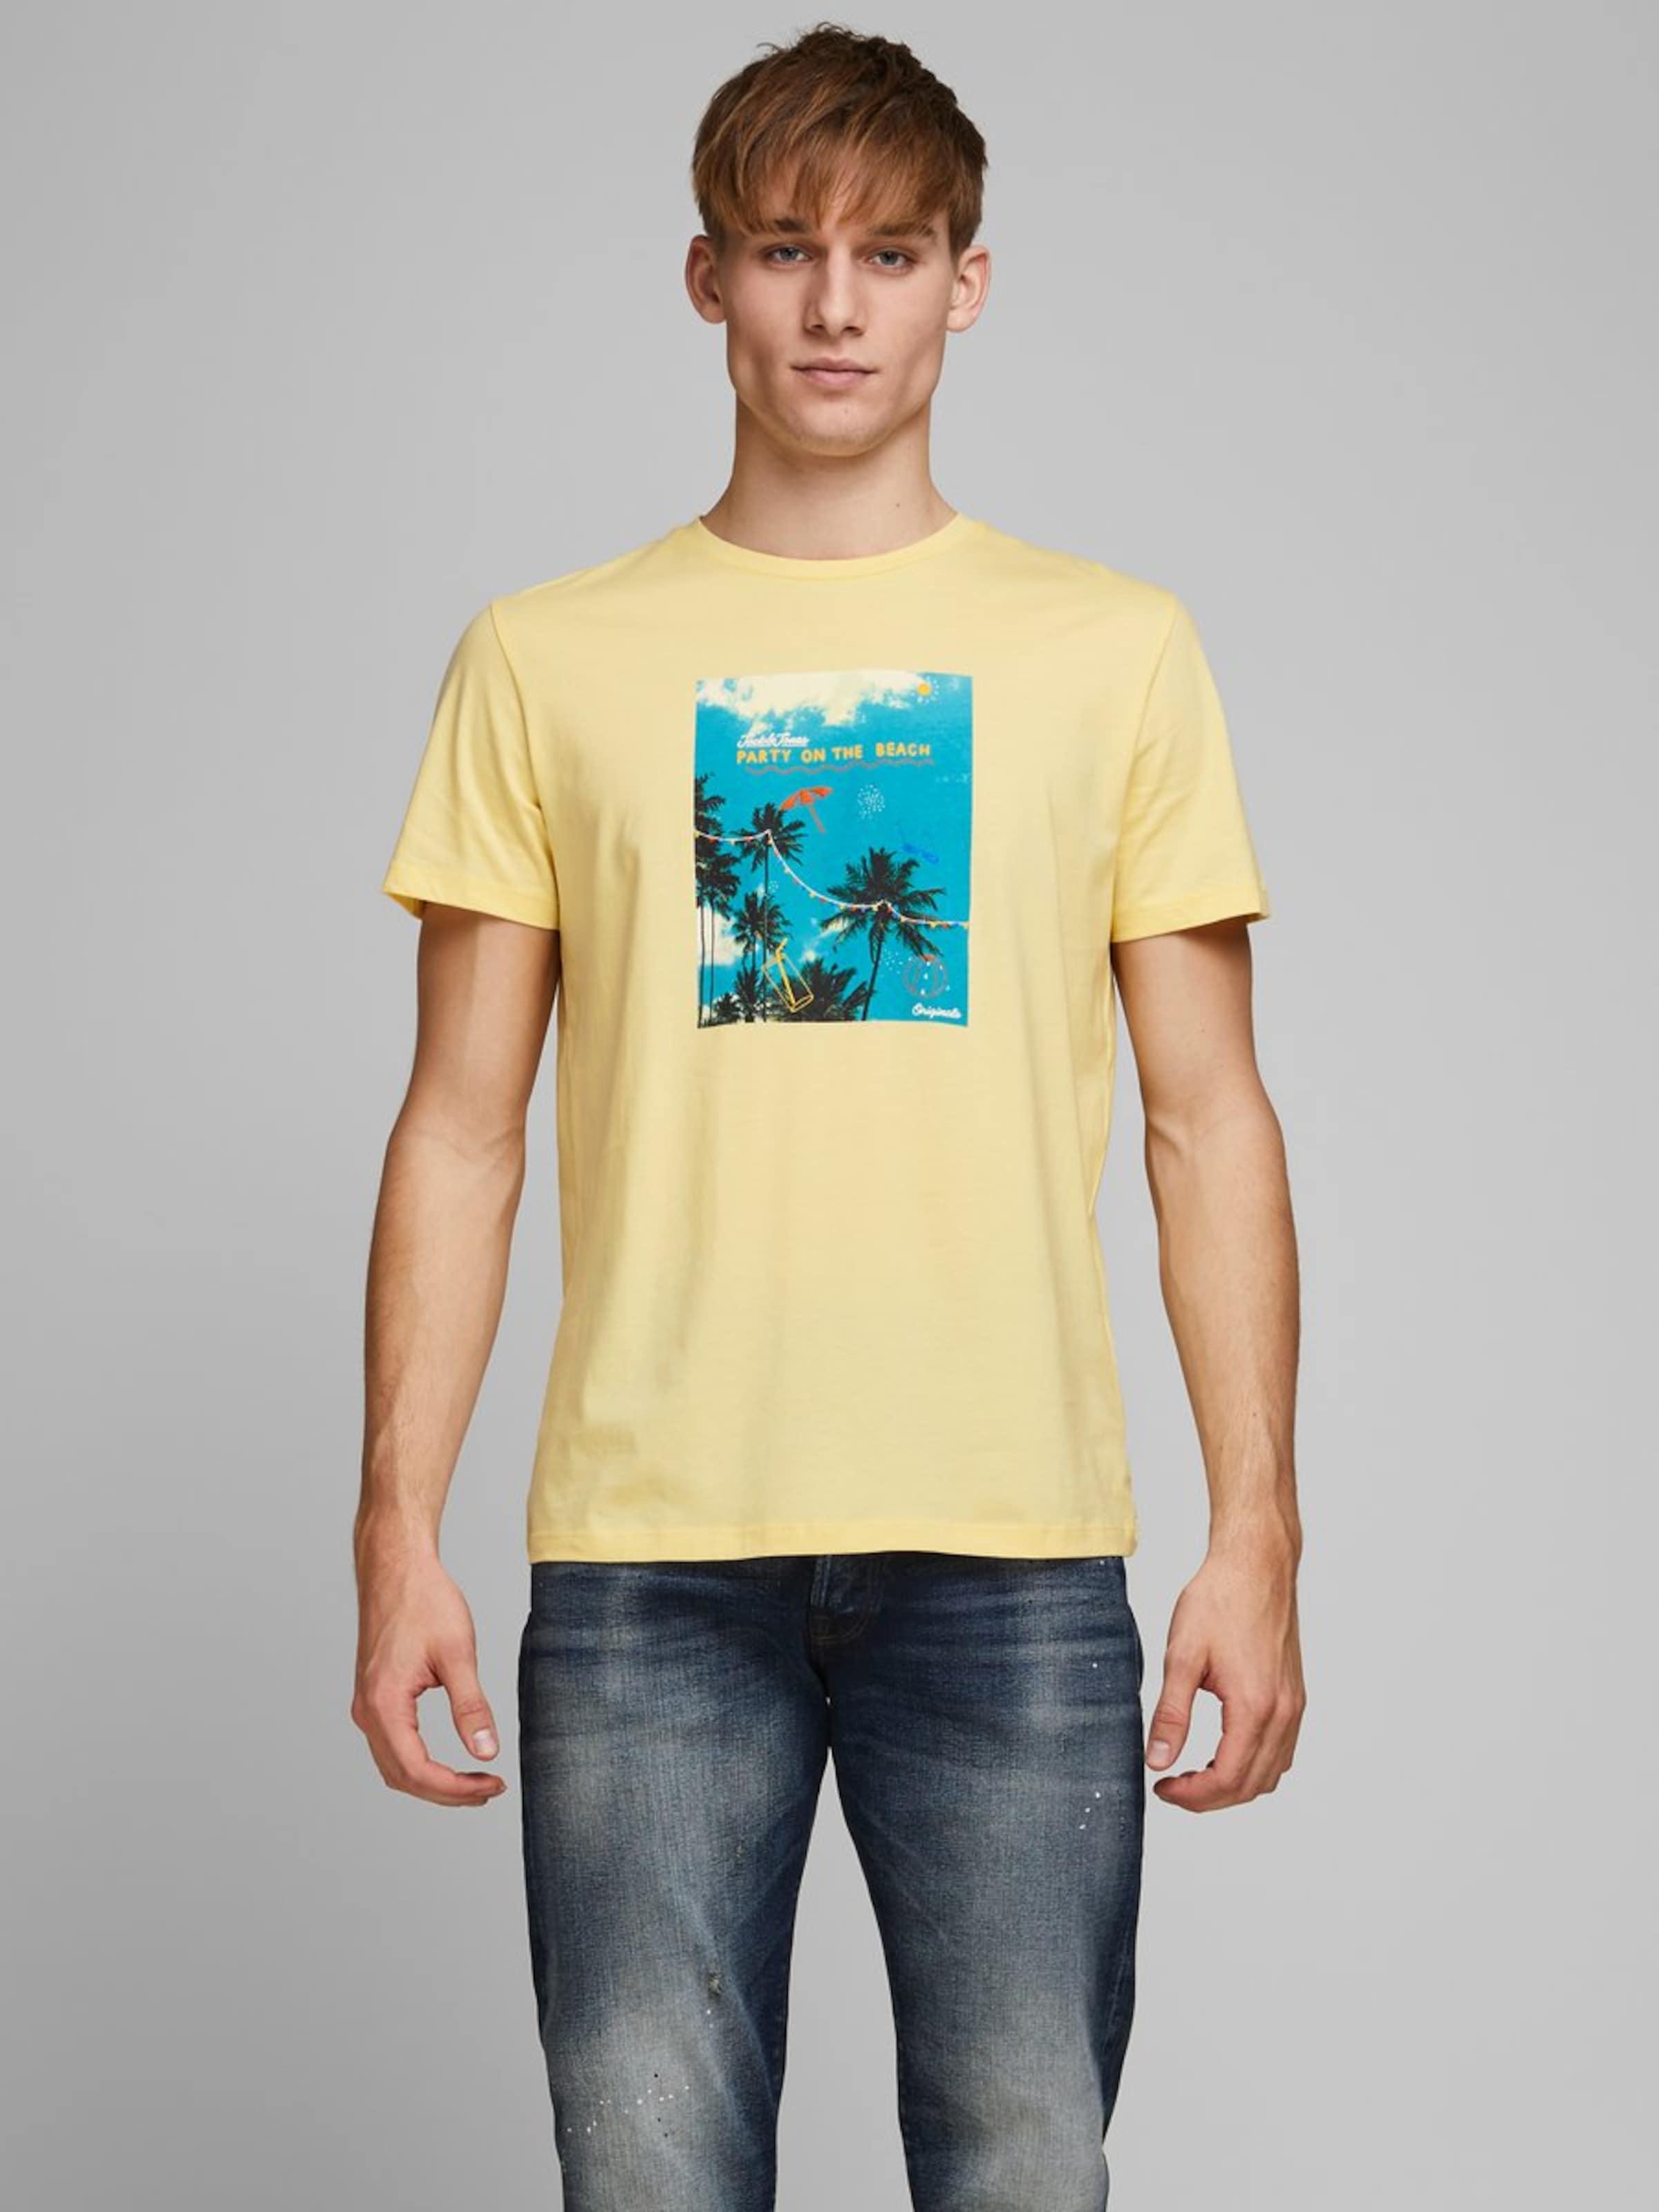 JACK & JONES T-Shirt in blau / gelb Motivprint 5714509155875